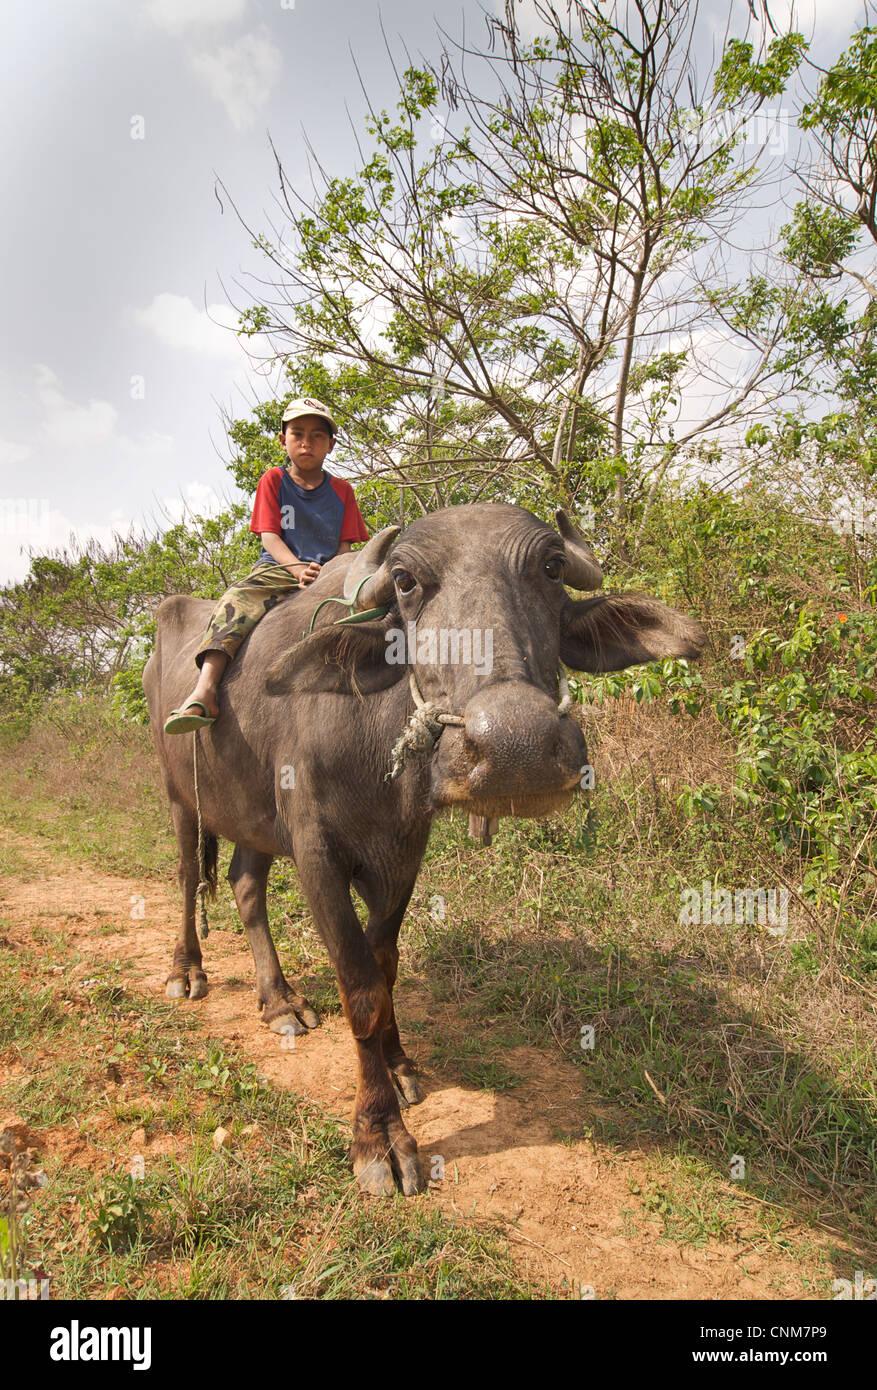 Burmese boy riding on a water buffalo en route to Pindaya, near Kalaw, Burma - Stock Image